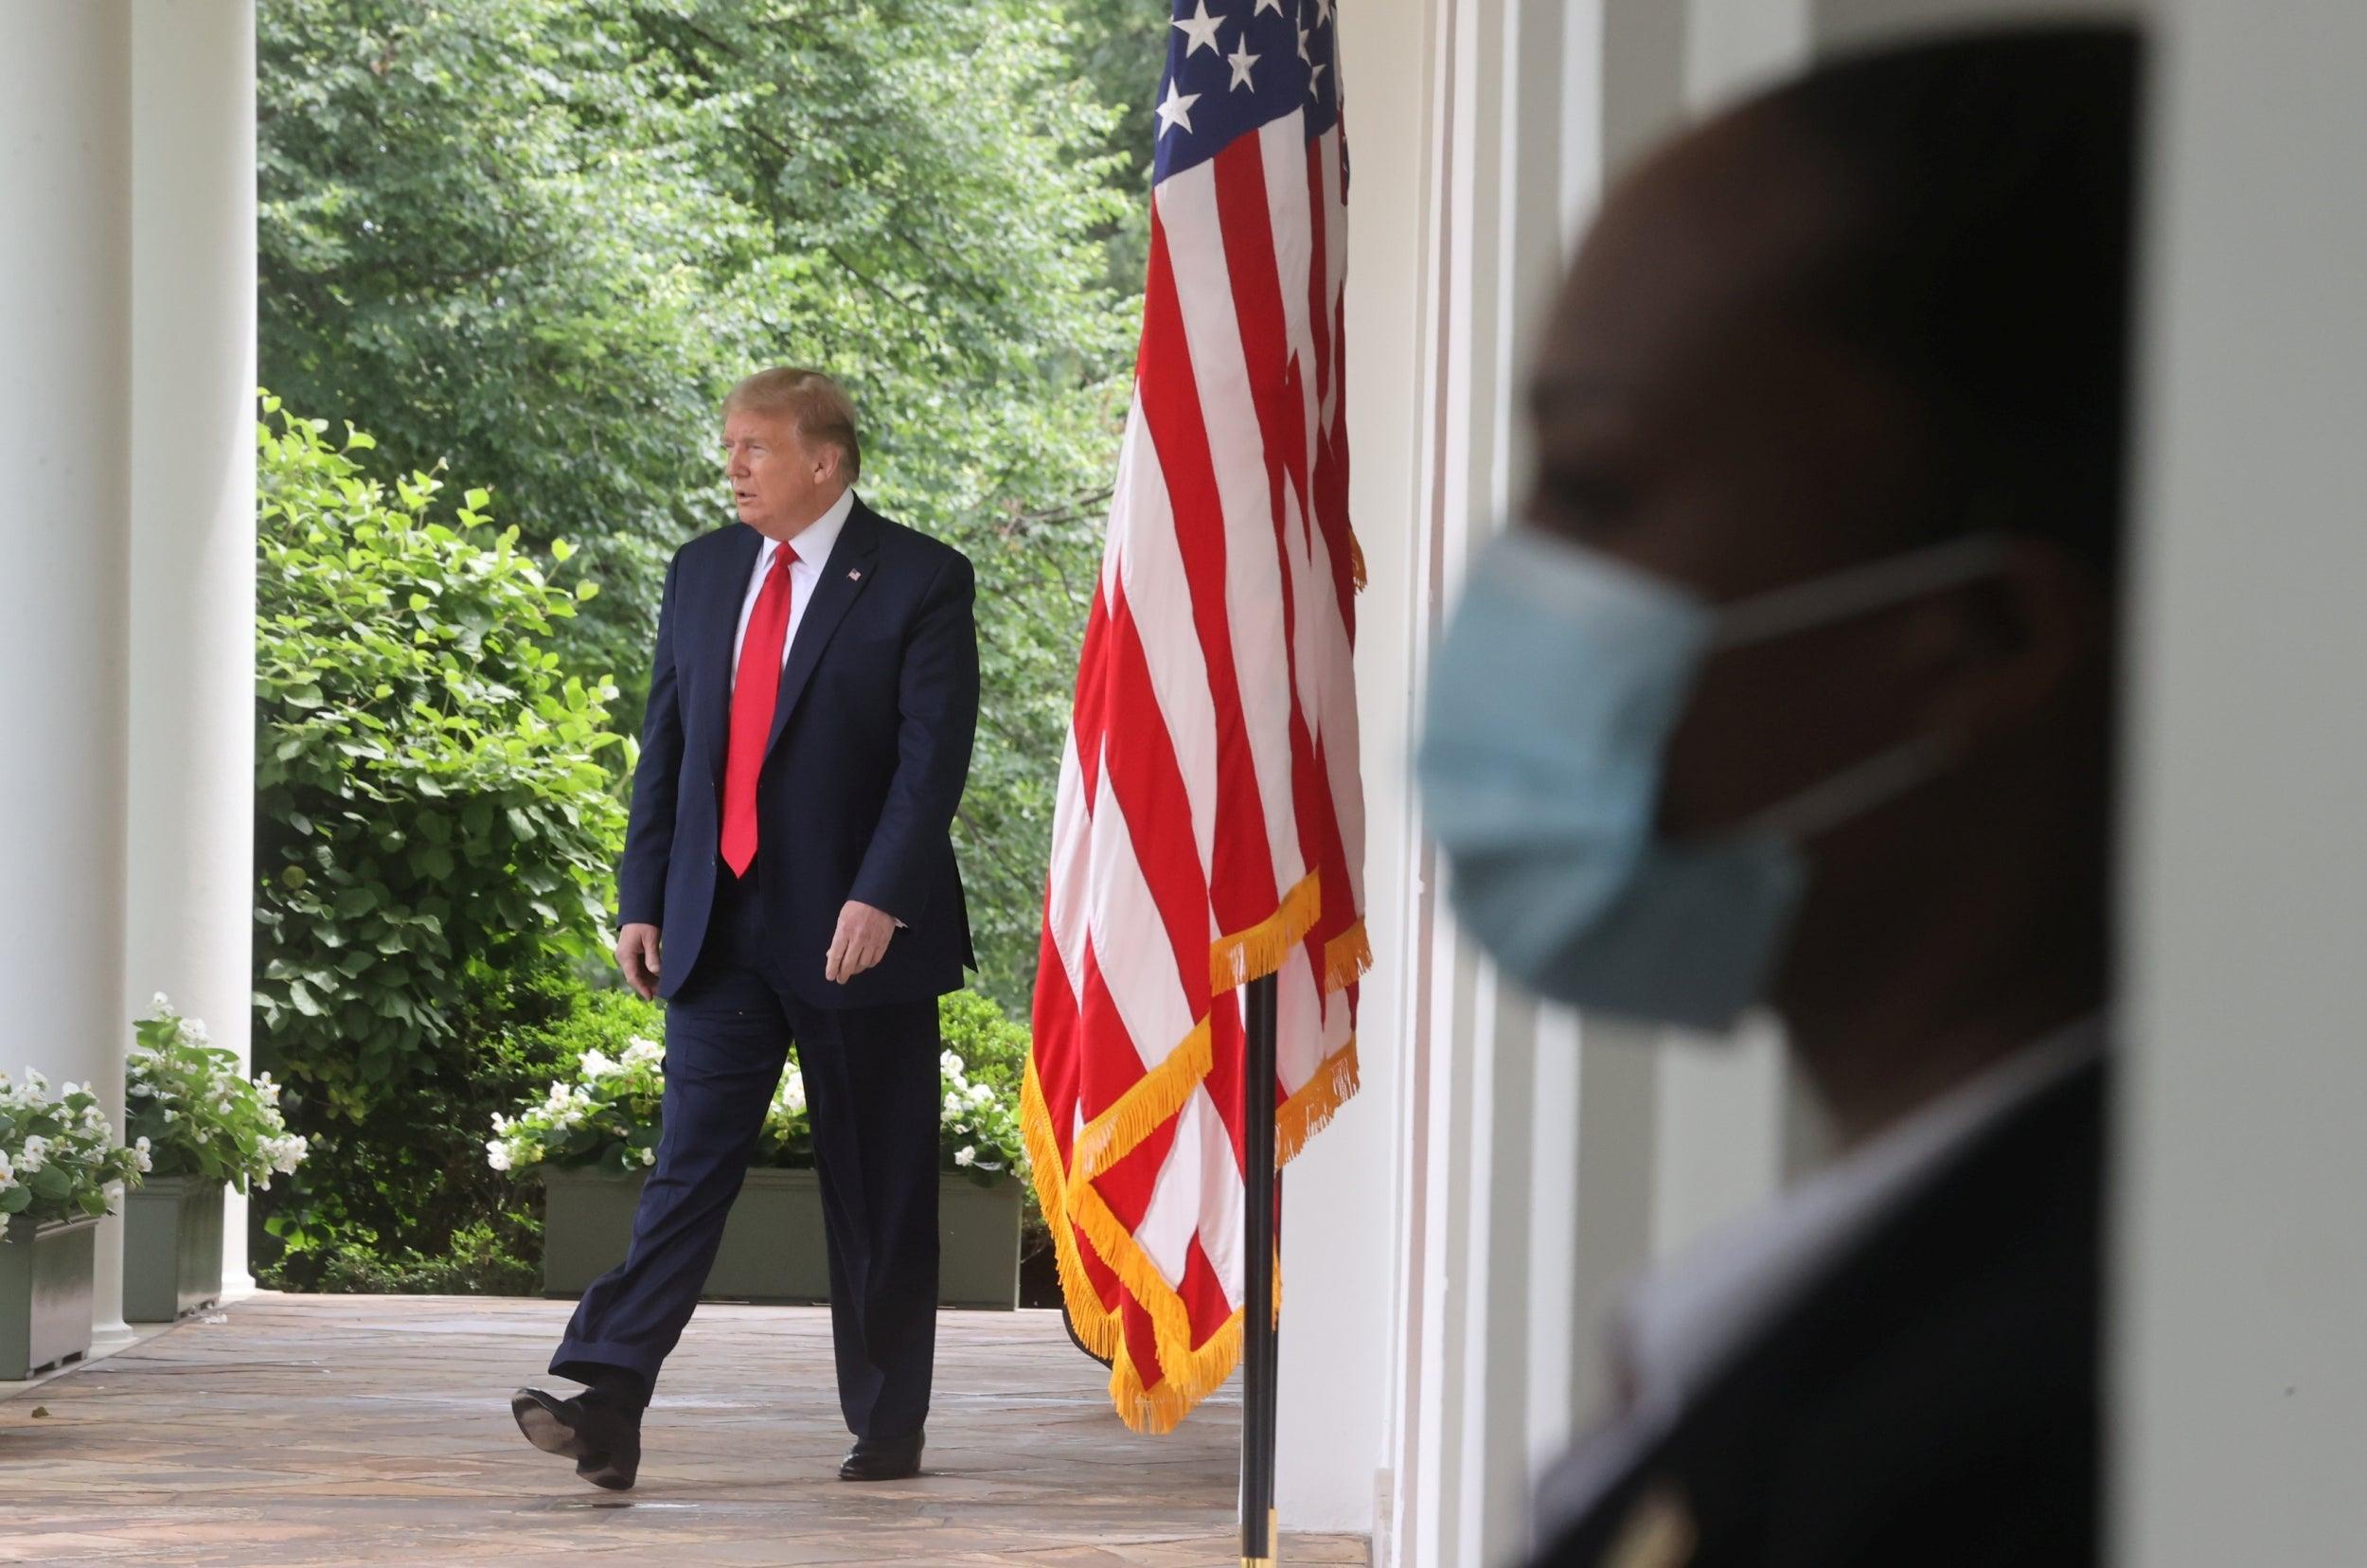 Trump demands Republican convention 'with no masks or social distancing' despite coronavirus pandemic